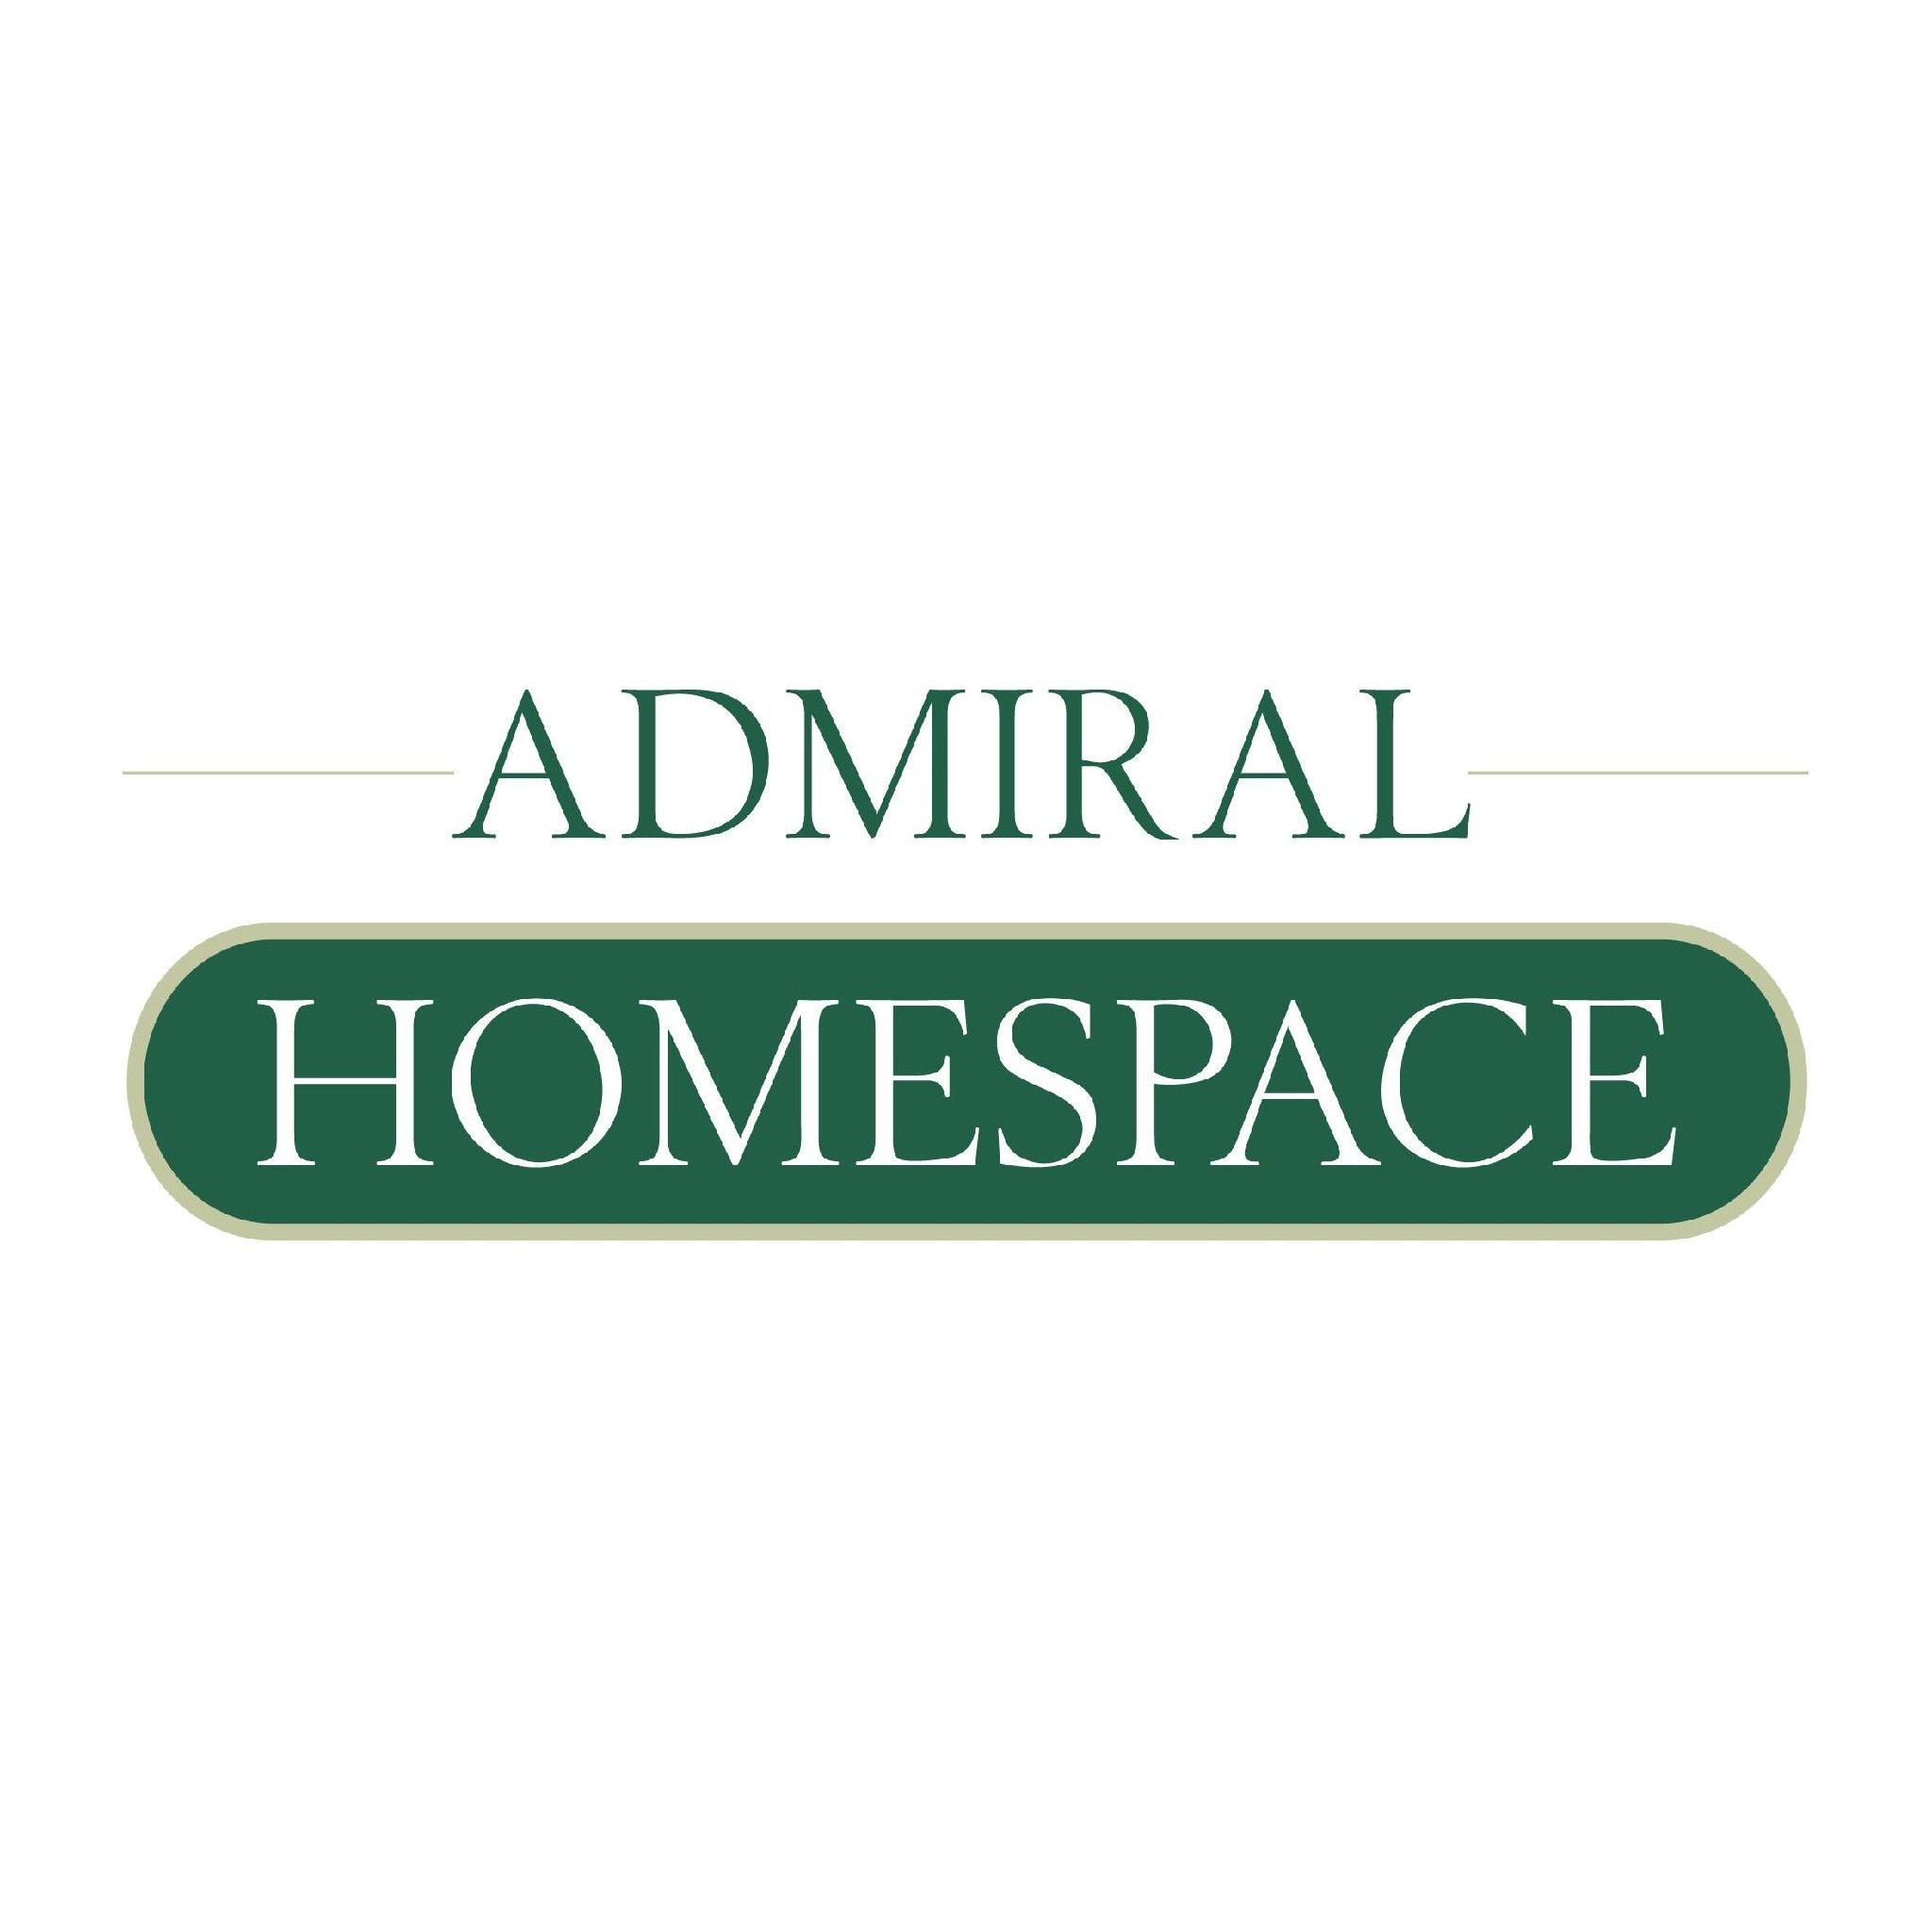 Admiral Homespace - Huntingdon, Cambridgeshire PE28 4FL - 01480 456789 | ShowMeLocal.com